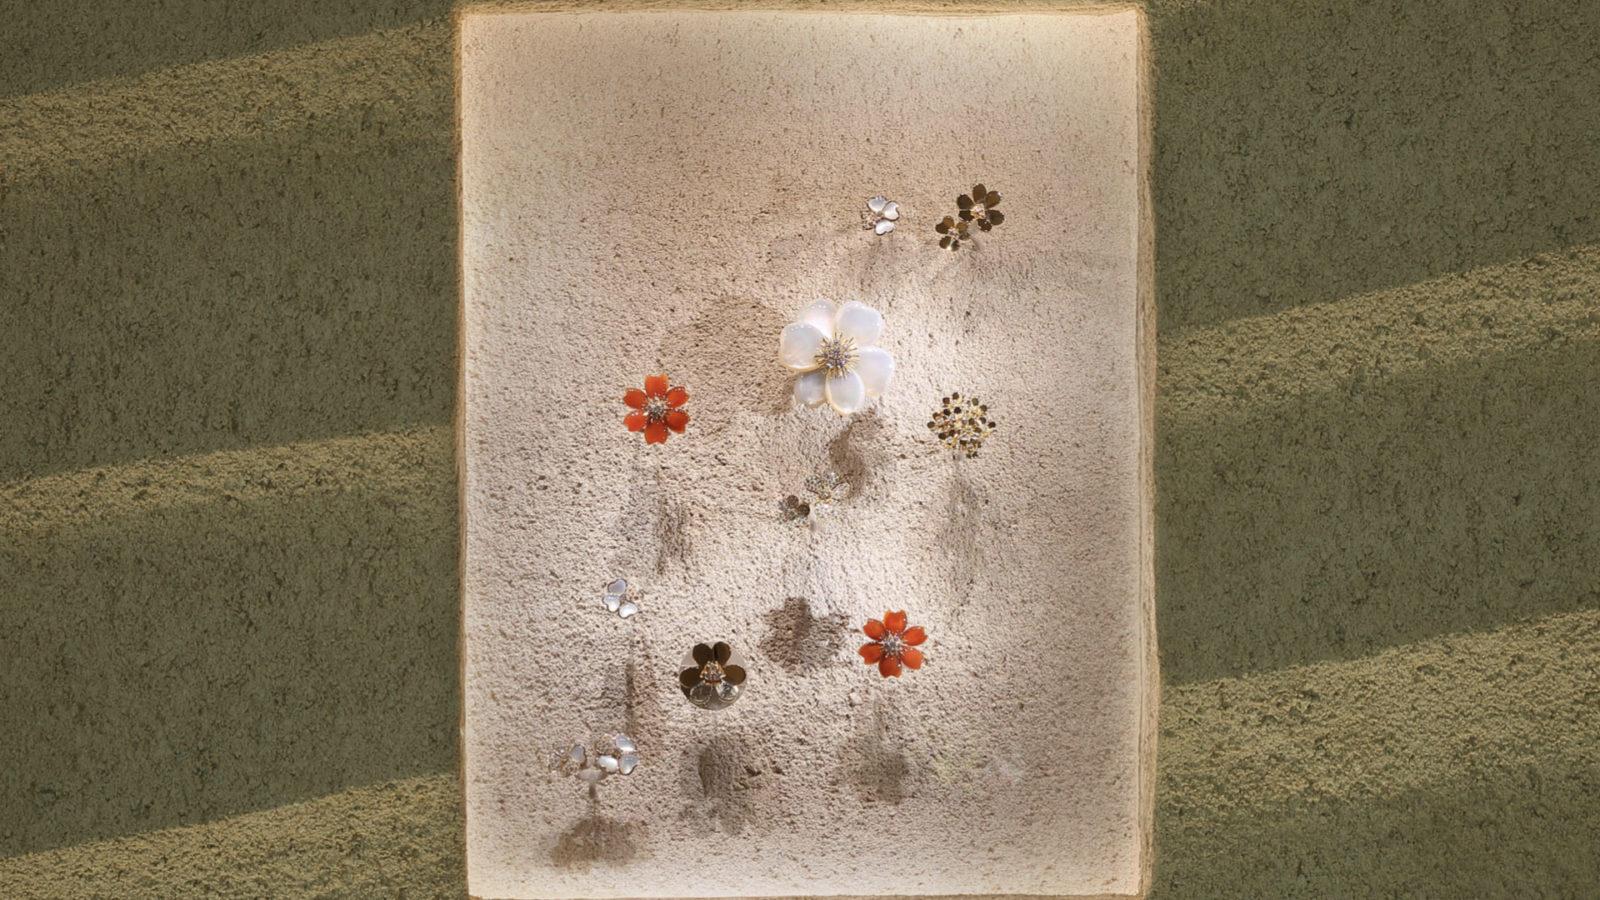 Van Cleef & Arpels 於東京舉行 LIGHT OF FLOWERS 期間限定展覽